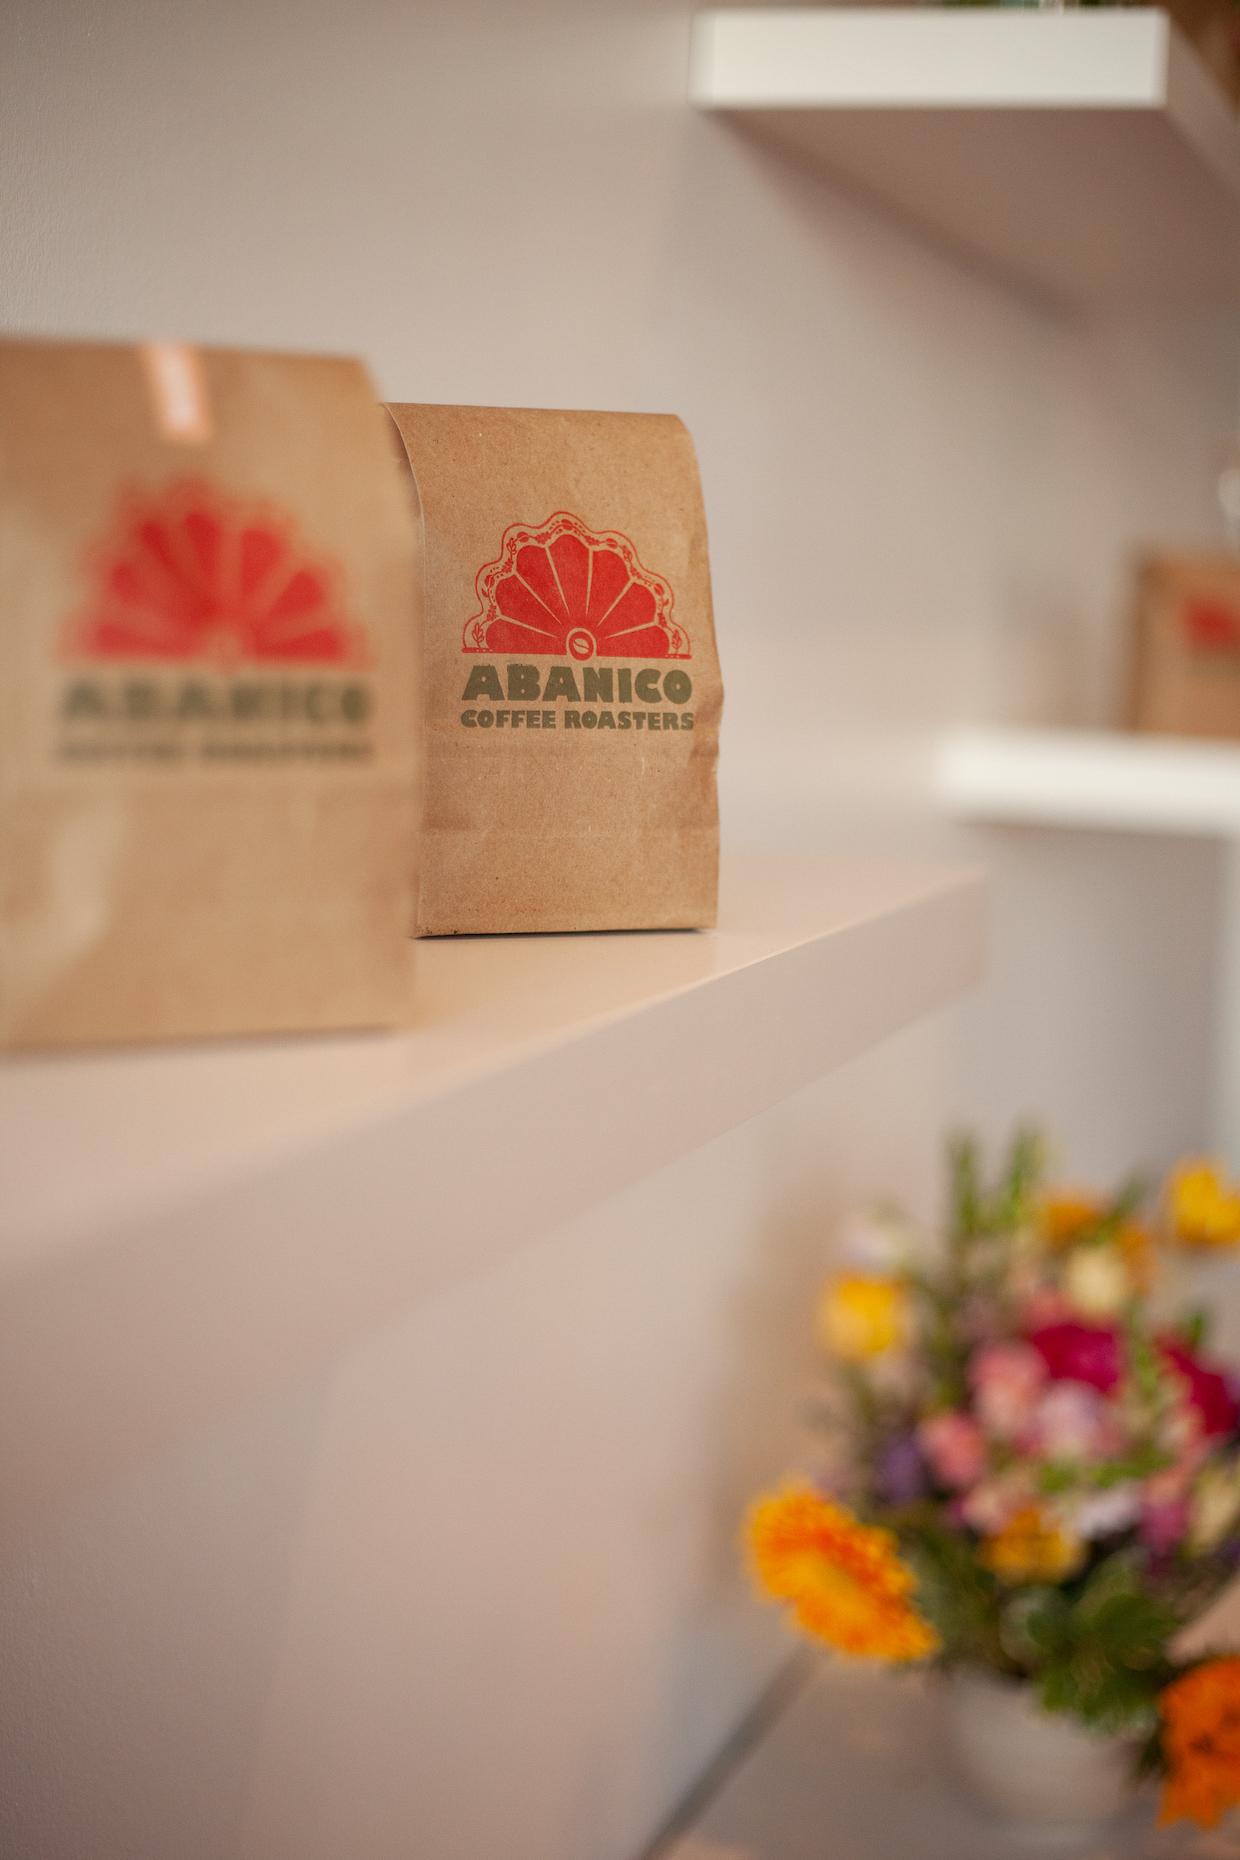 Albanico Coffee San Francisco Mission 2